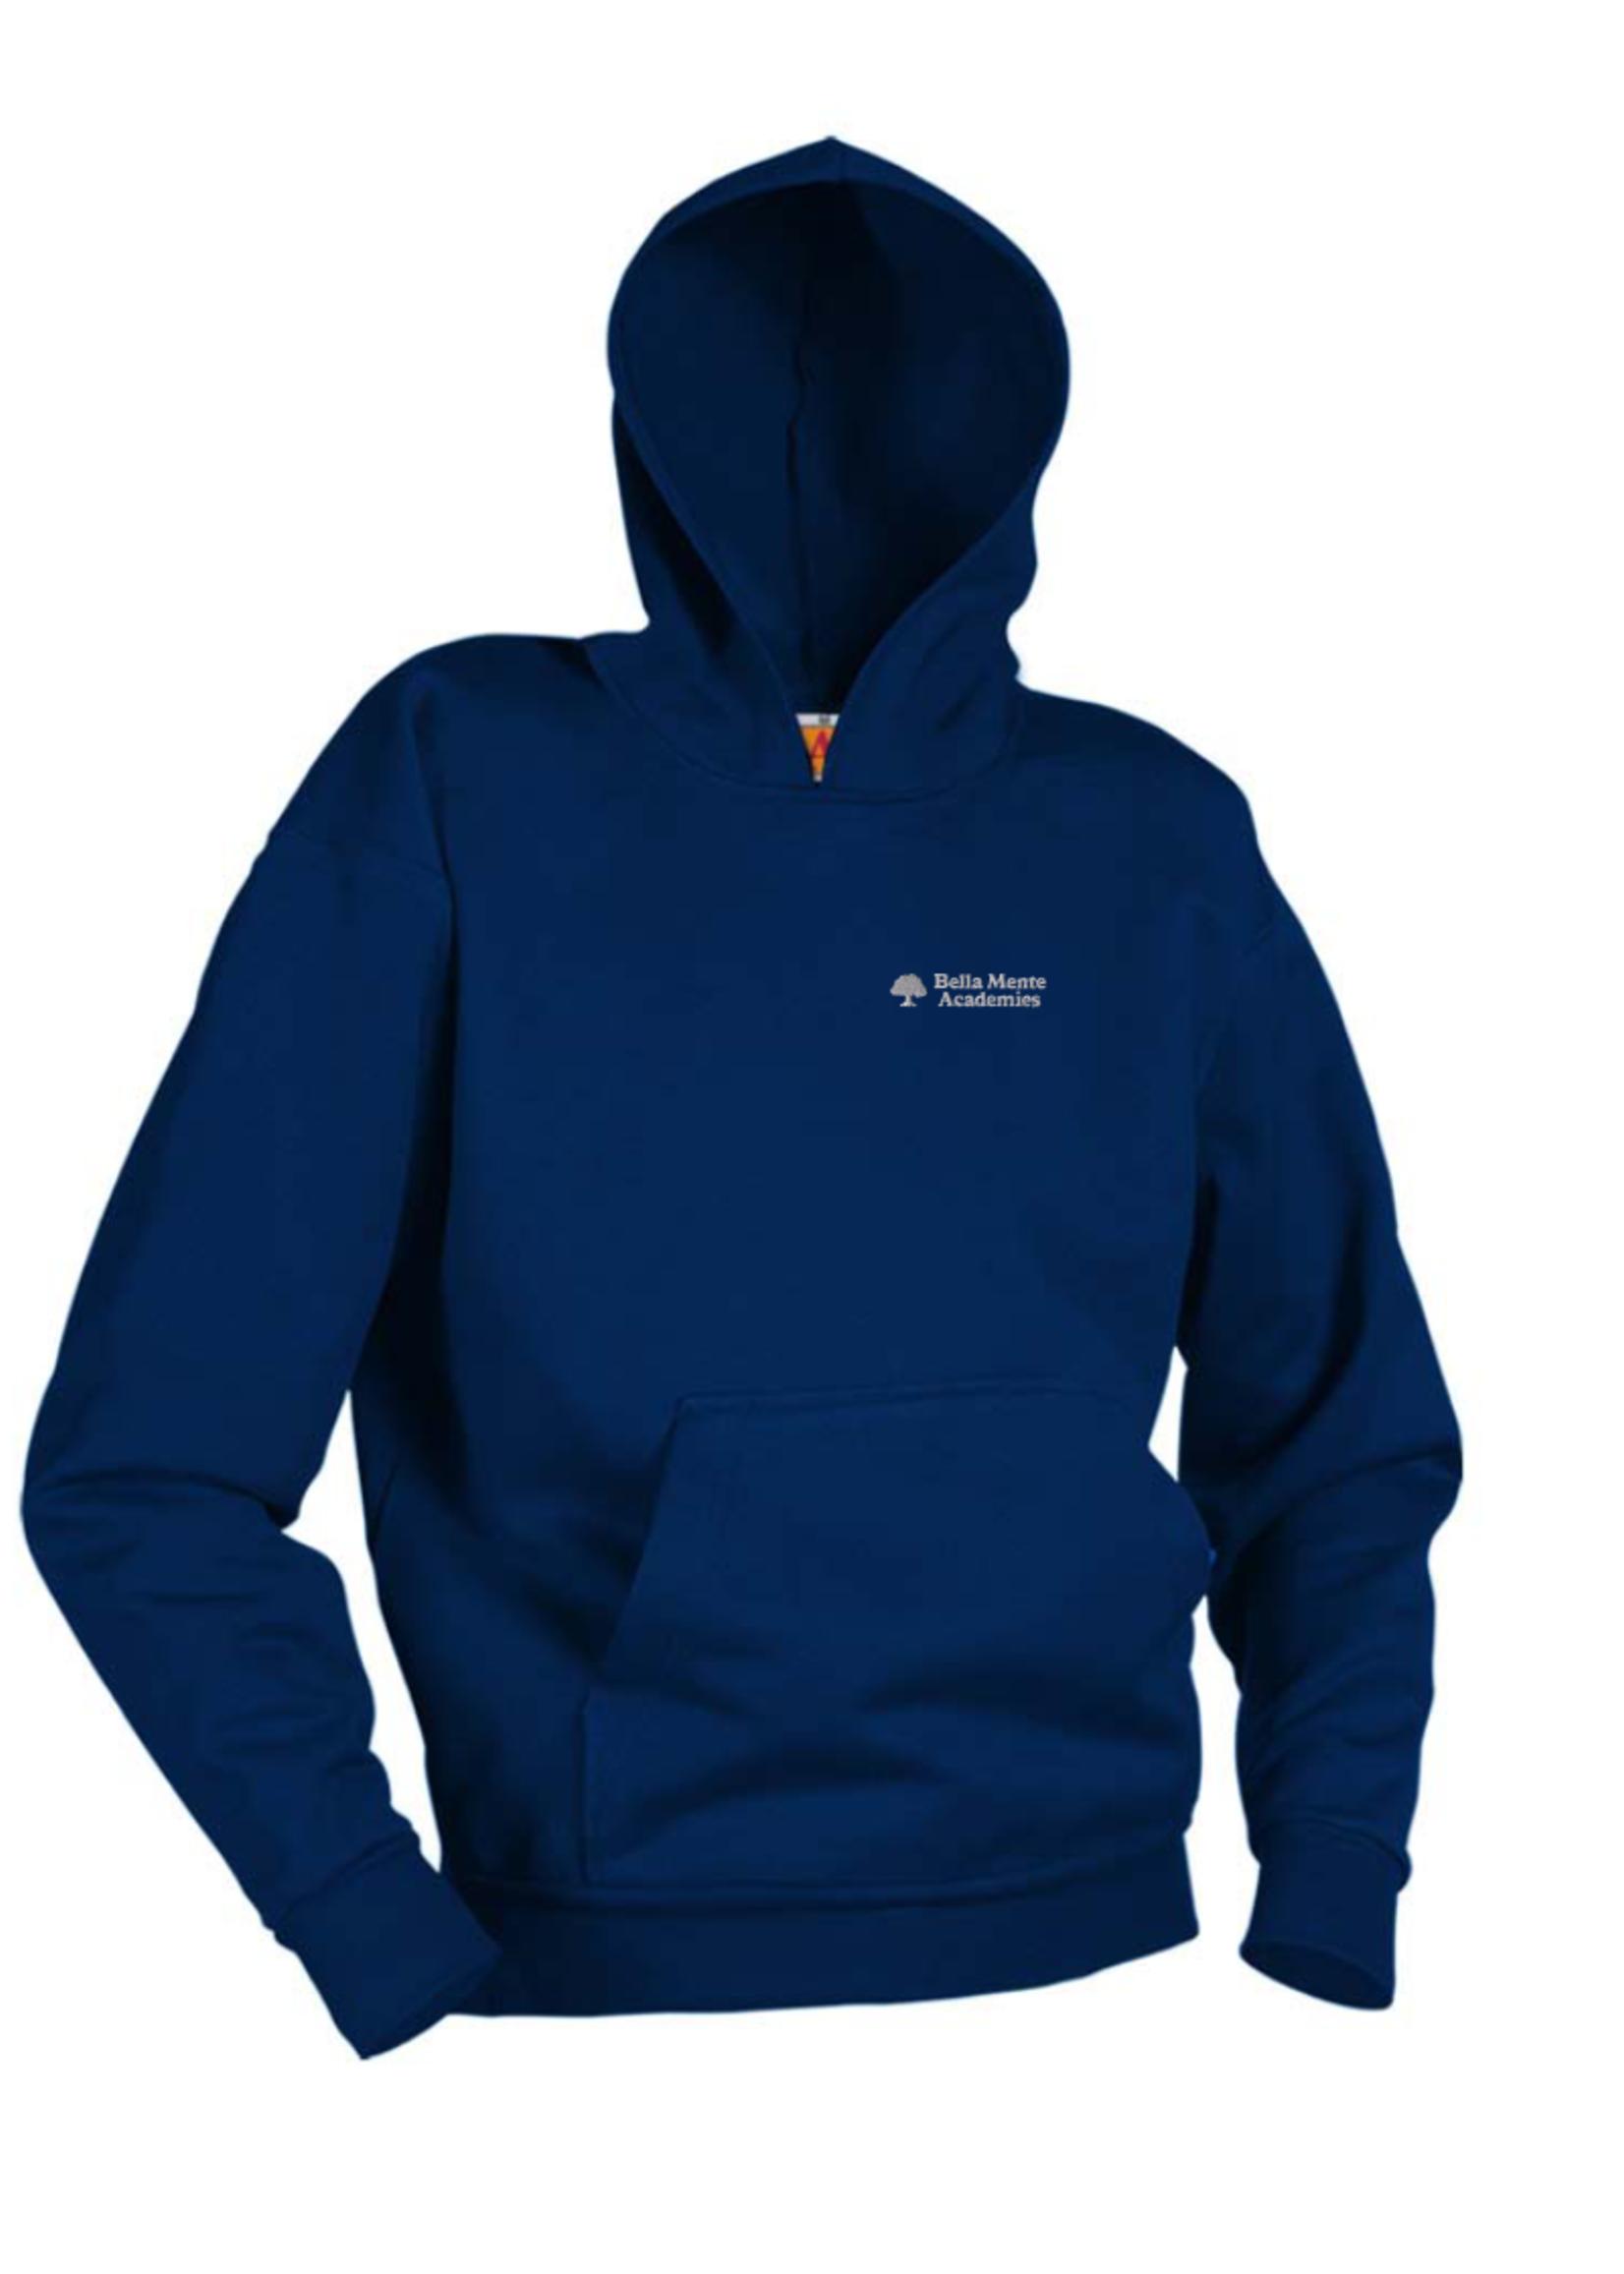 BMA Navy Hooded Pullover Sweatshirt